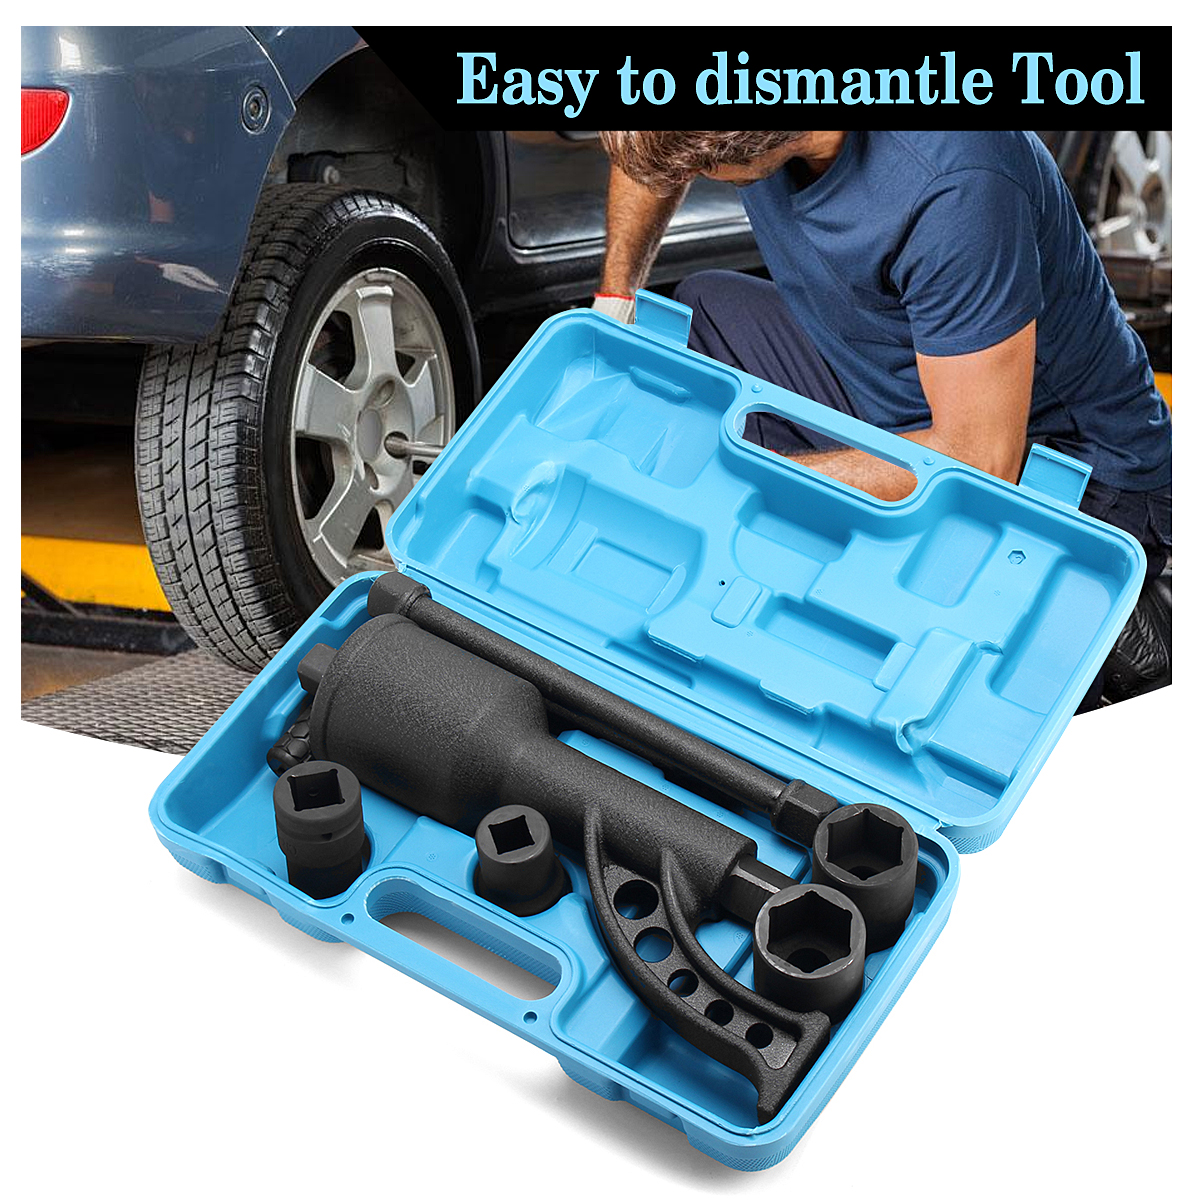 1:110 Ratio Saving Wrench Lug Nut Remover Labor Heavy Duty Torque Multiplier